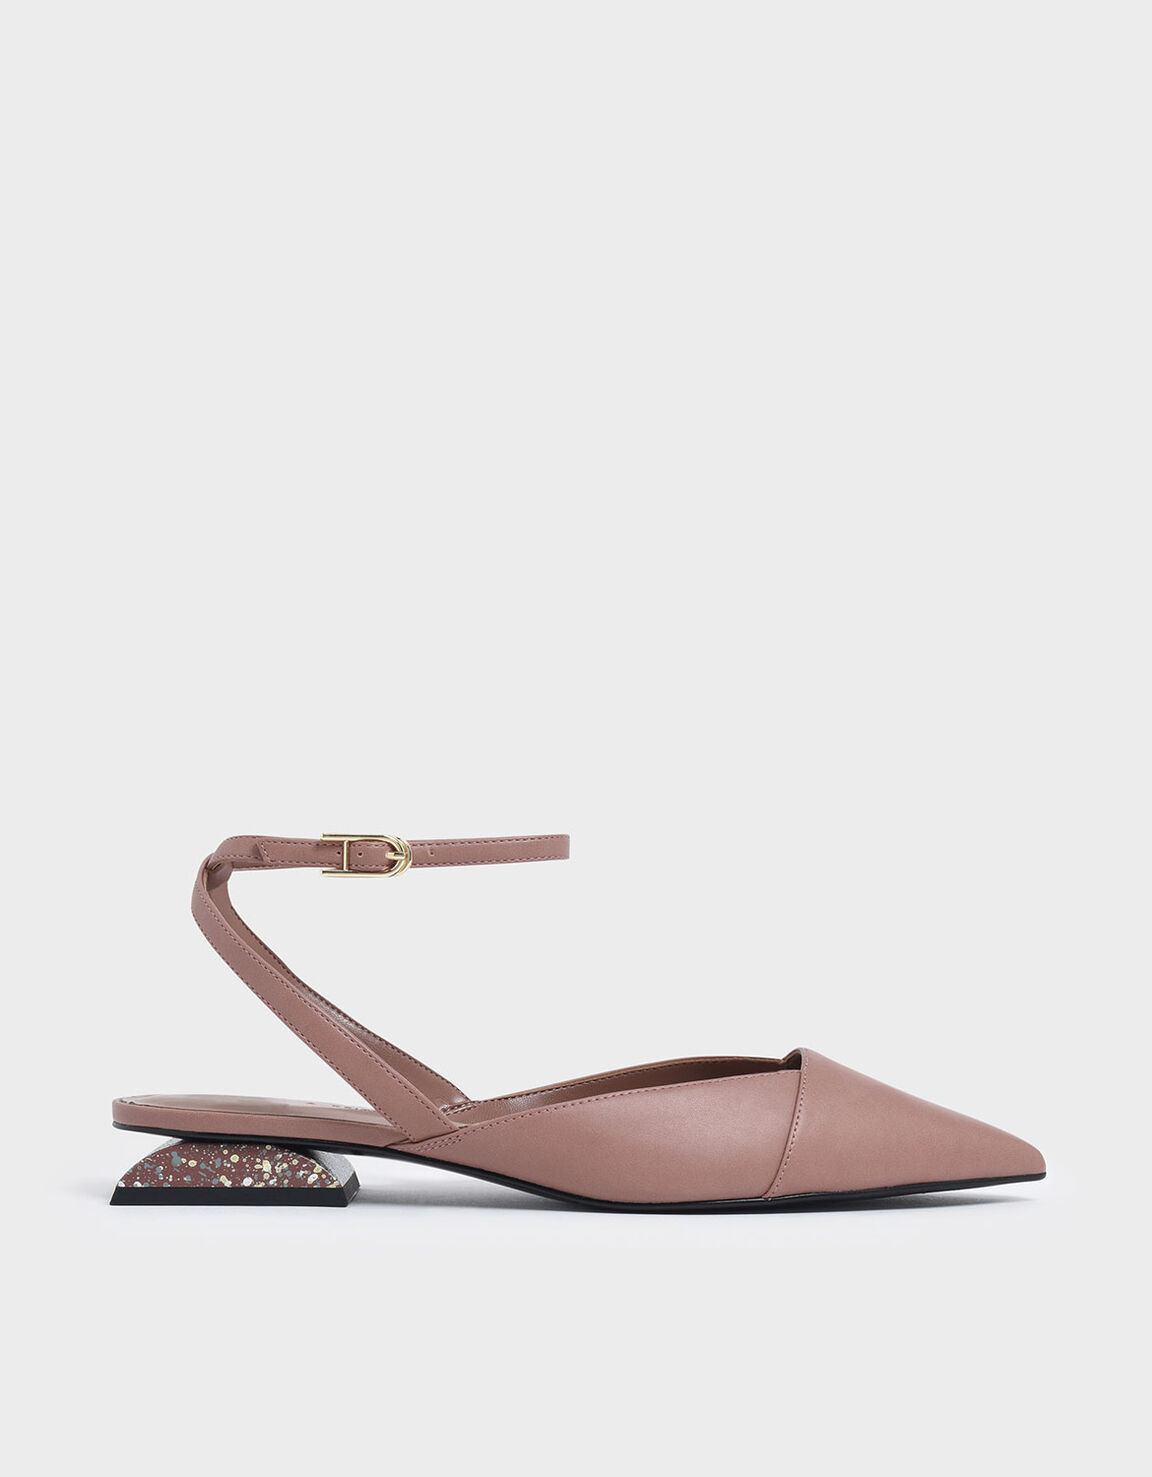 CHARLES & KEITH 鞋款低至34折優惠!:第19張圖片